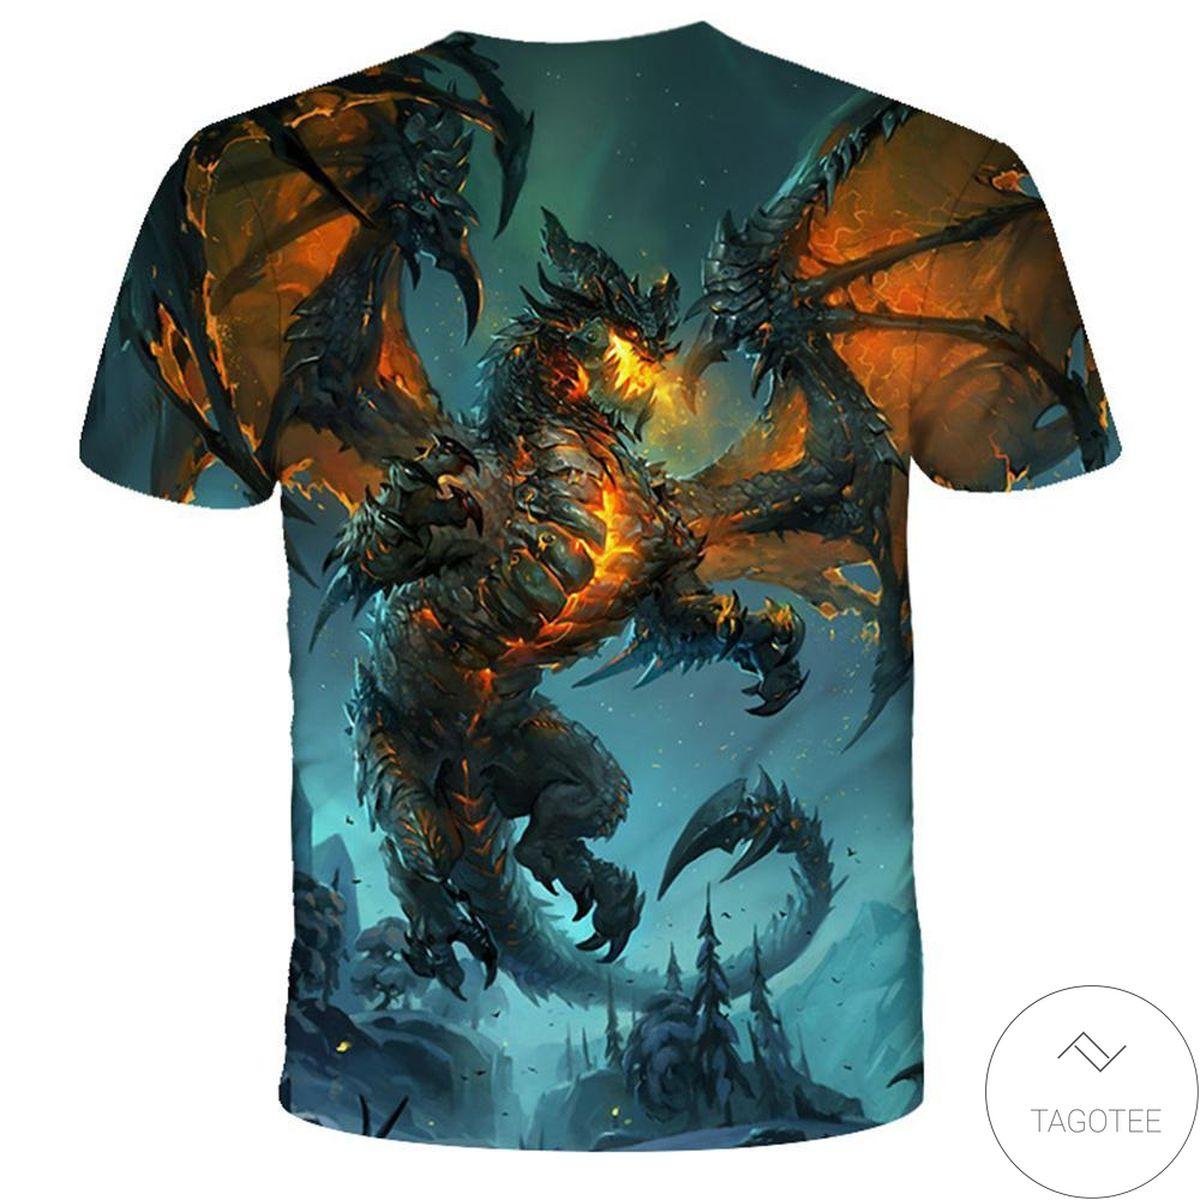 Present The Dragon 3d Graphic Printed Short Sleeve Shirt